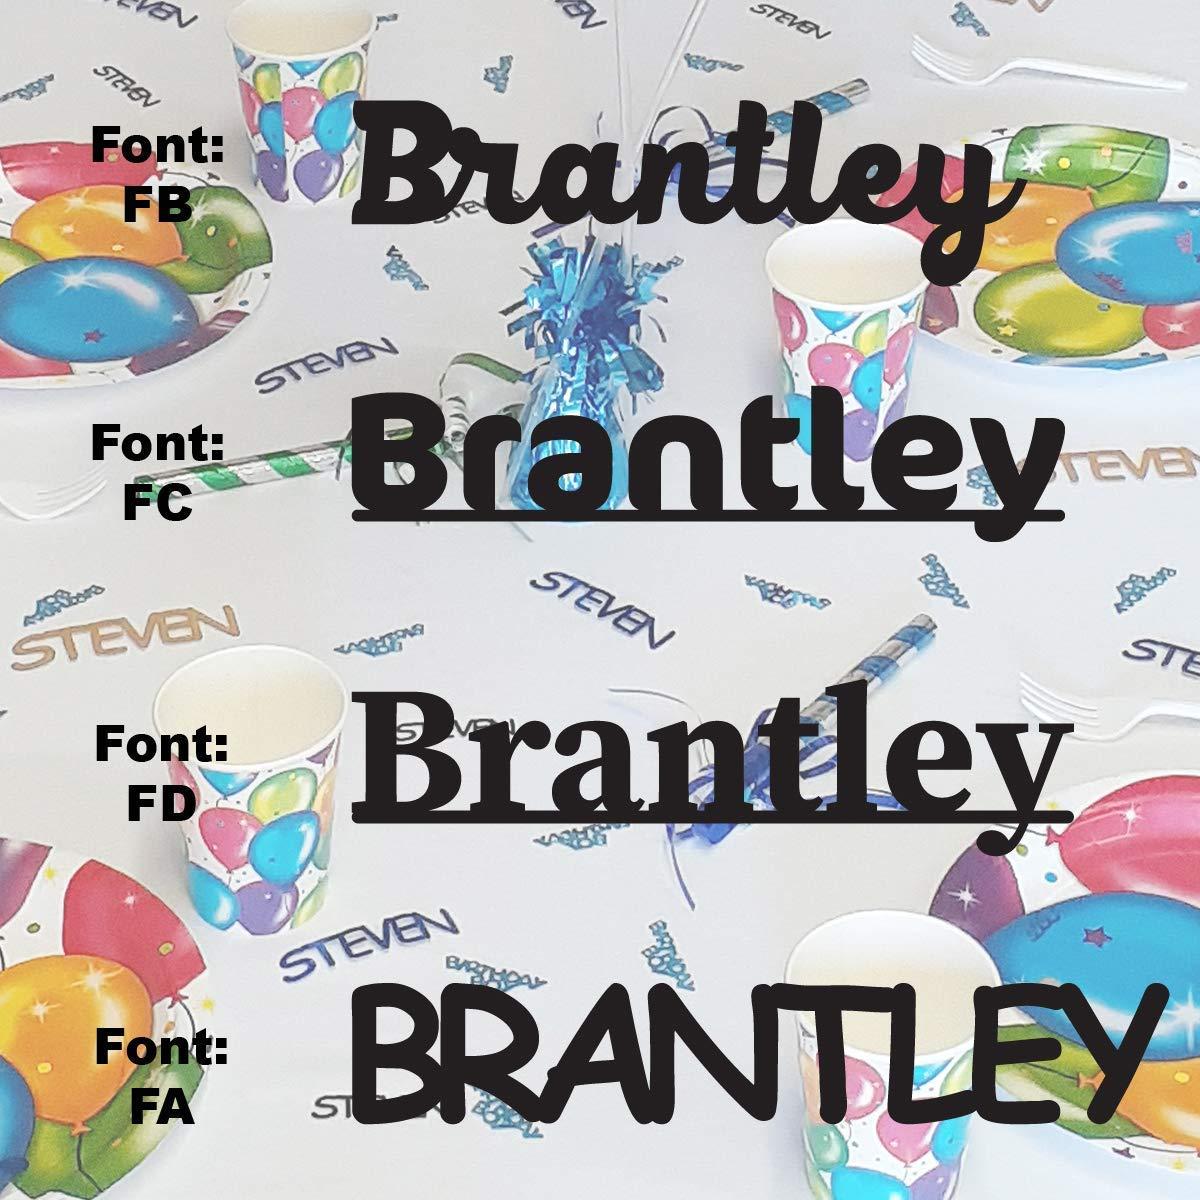 Spring new work BRANTLEY - Name Confetti Max 76% OFF in Colors. Confett Includes Metallic 12